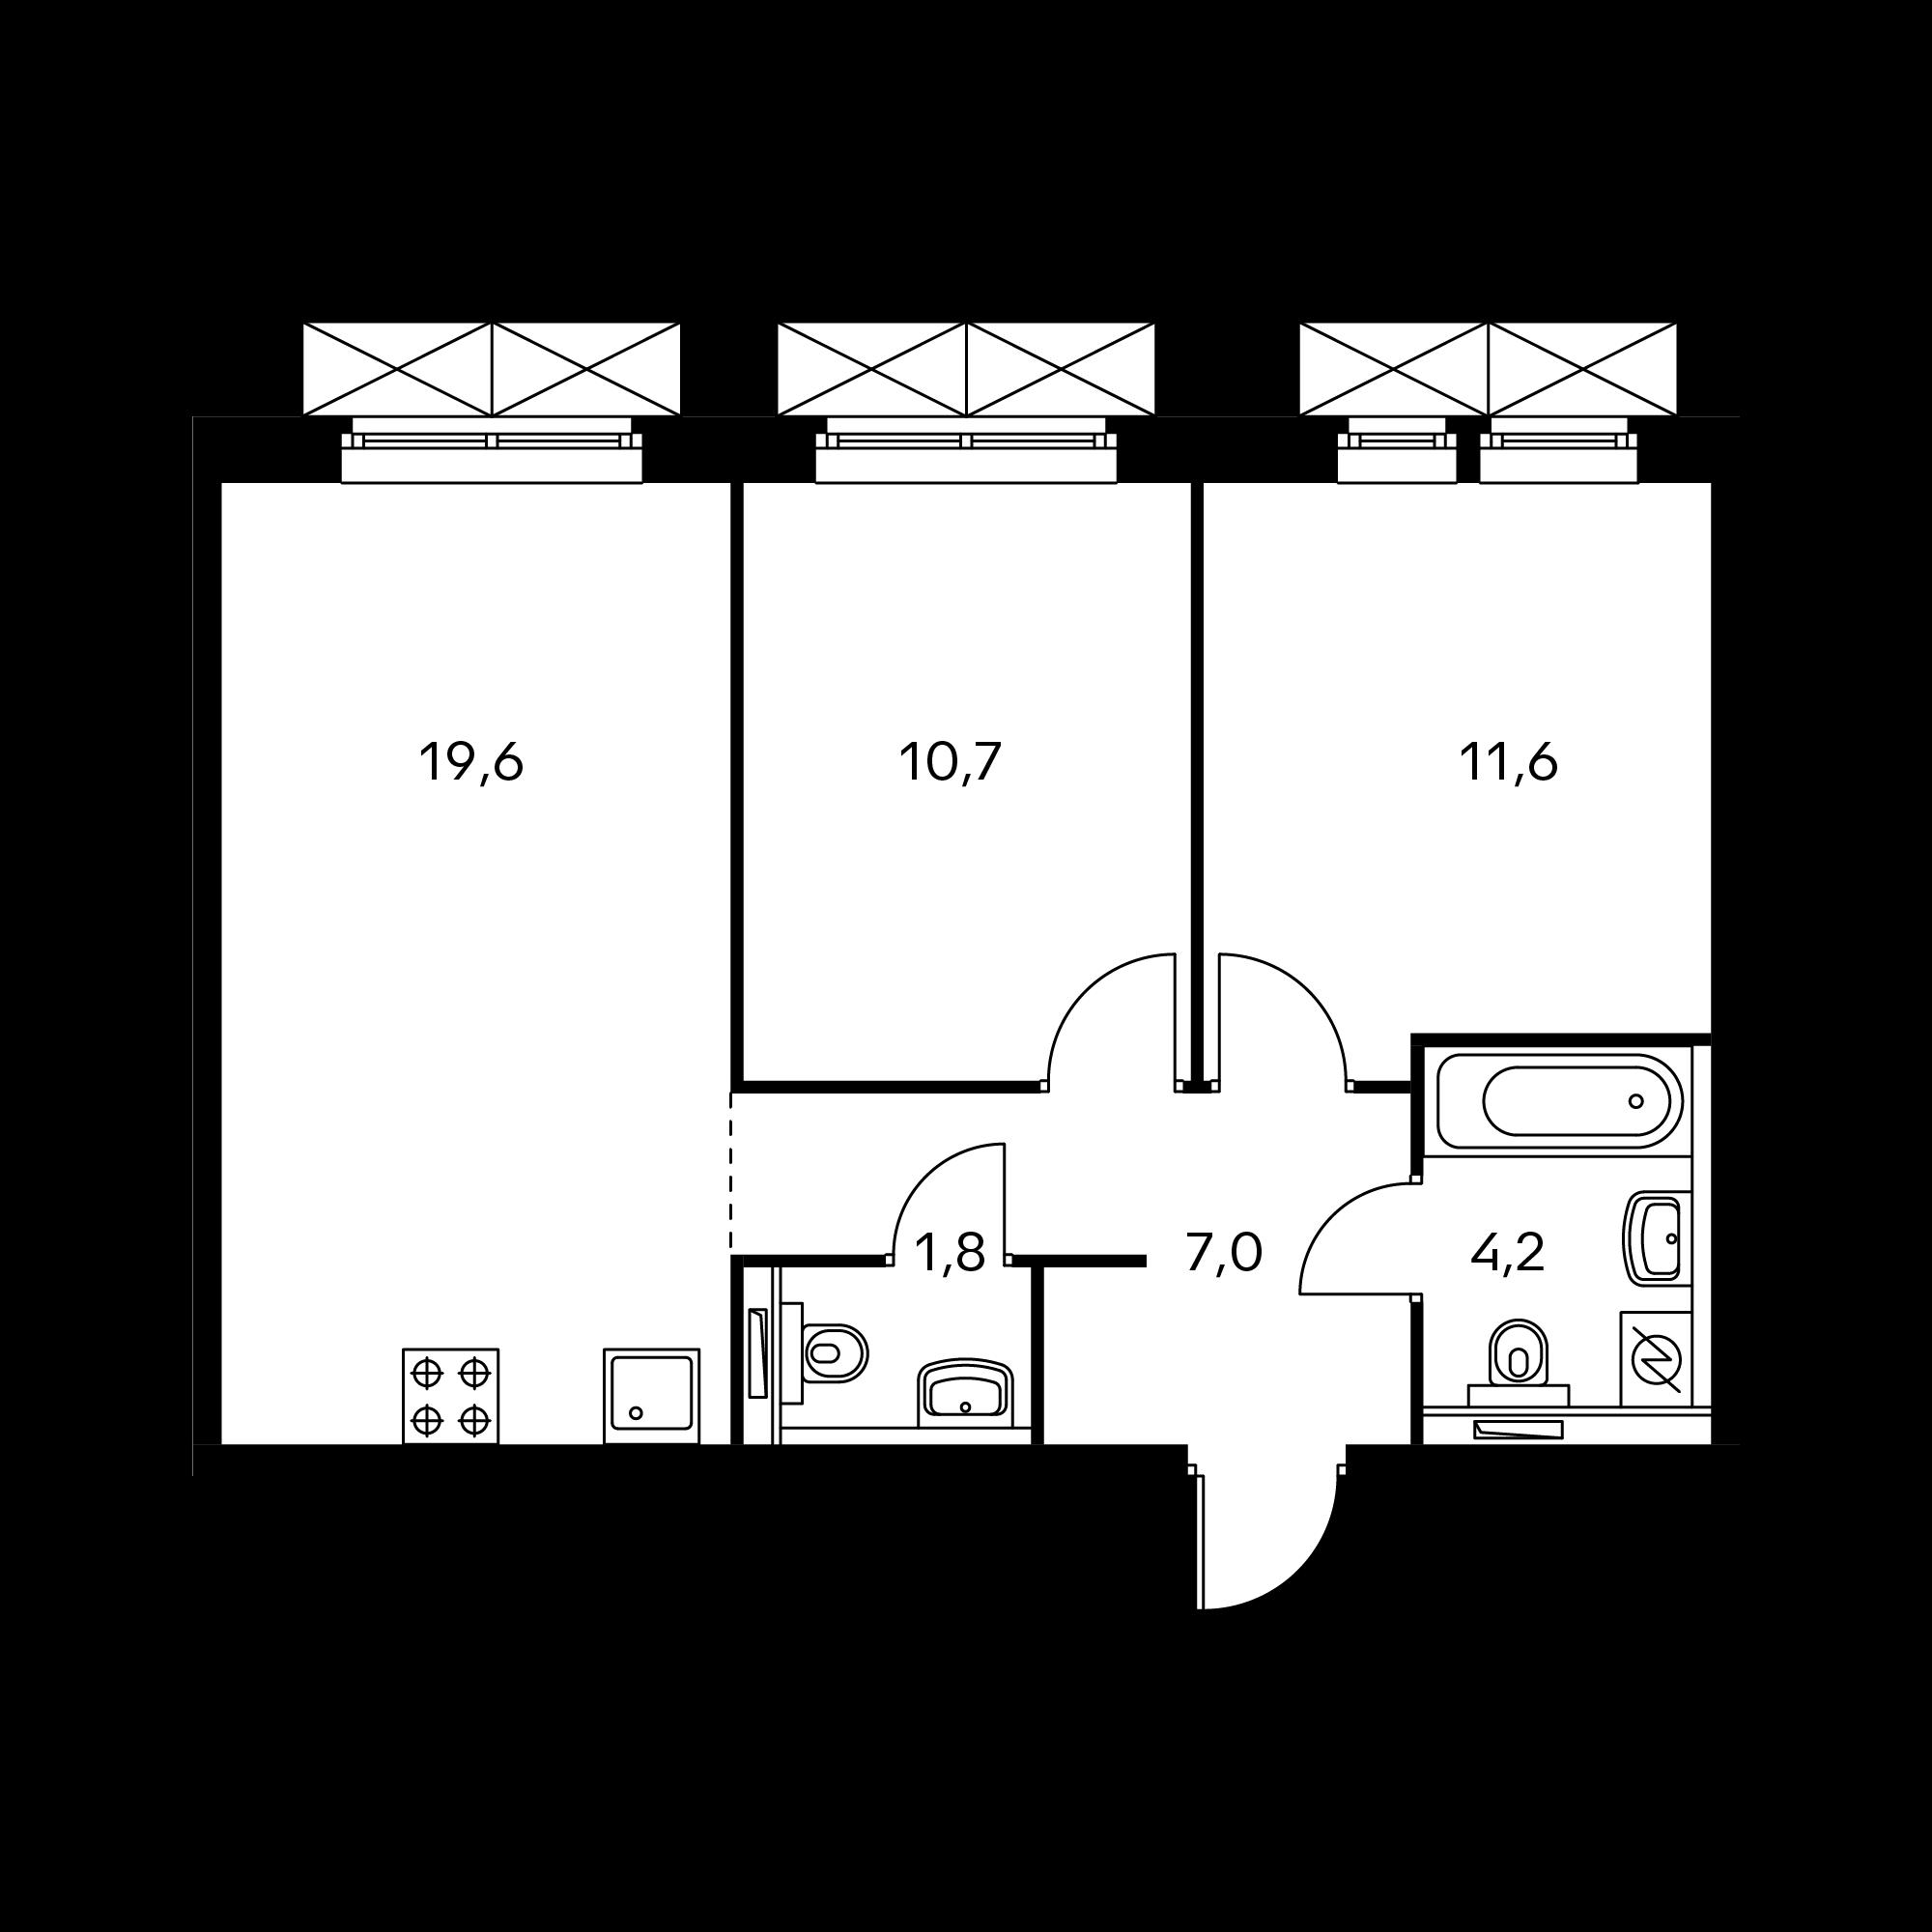 2ES8_9.6-2